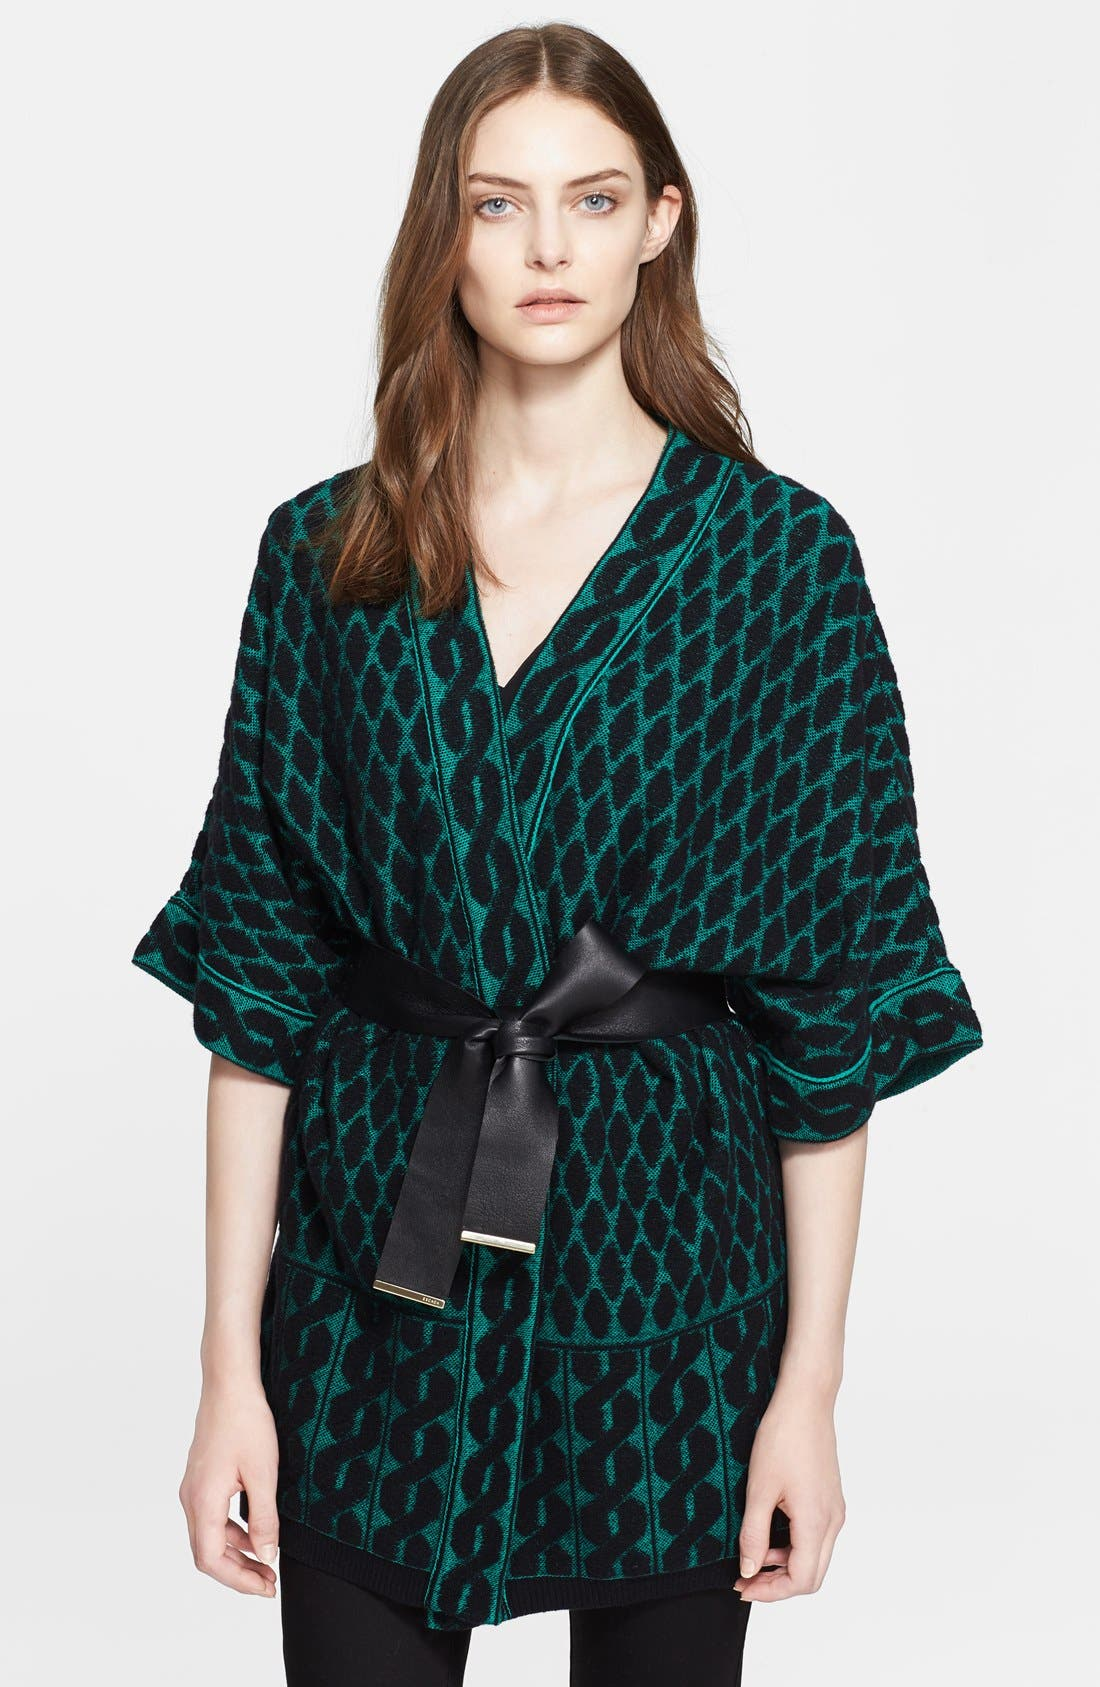 Alternate Image 1 Selected - ESCADA Leather Belted Jacquard Knit Cardigan